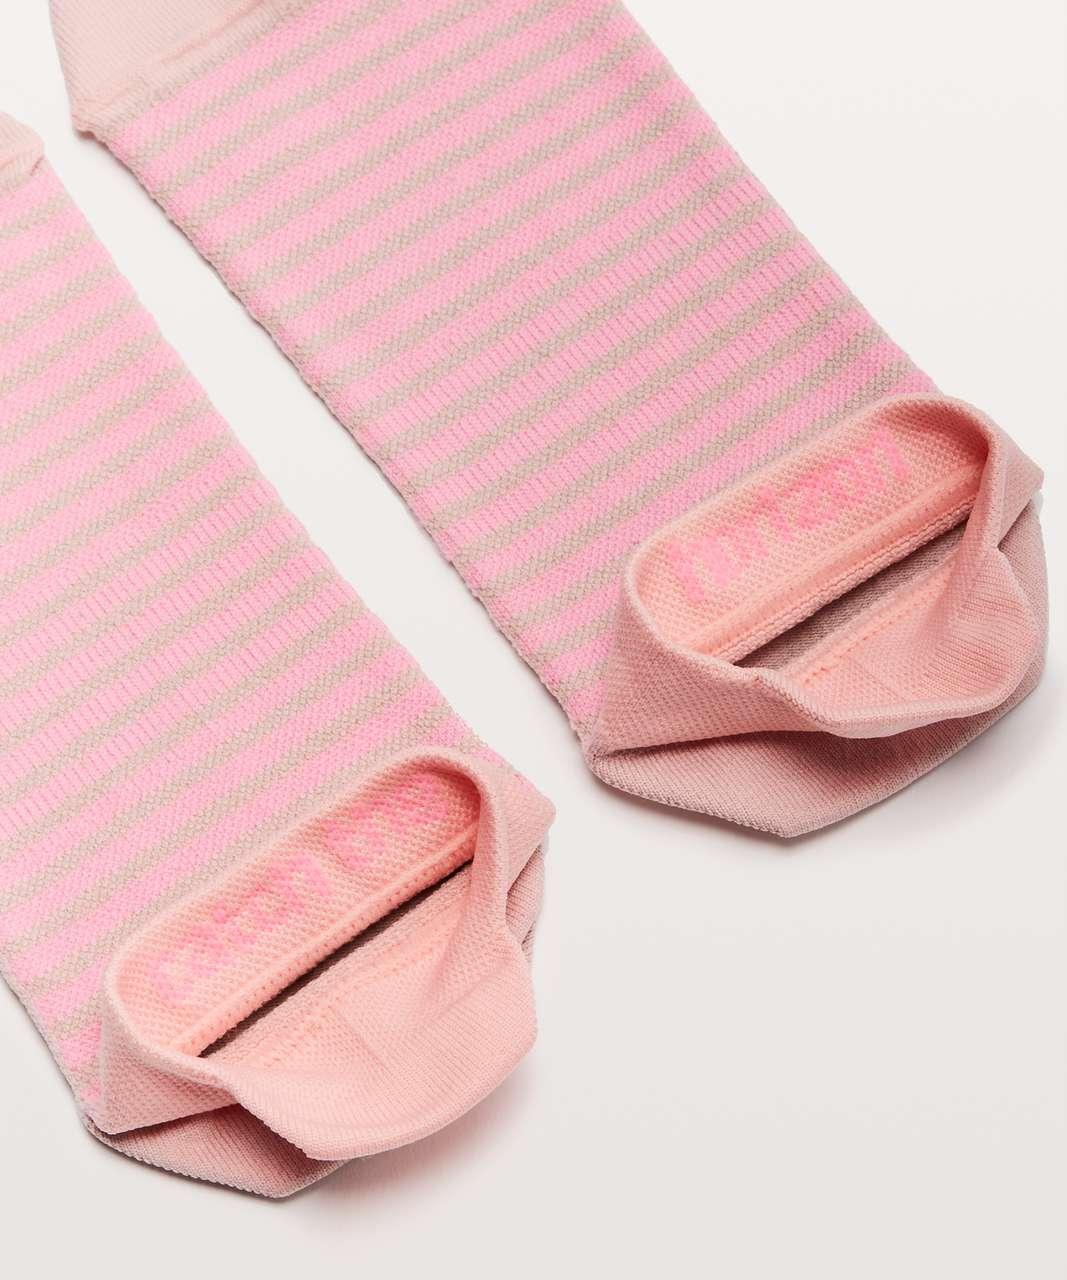 Lululemon Light Speed Sock *Silver - Cupcake Pink / Polarized Pink Tone